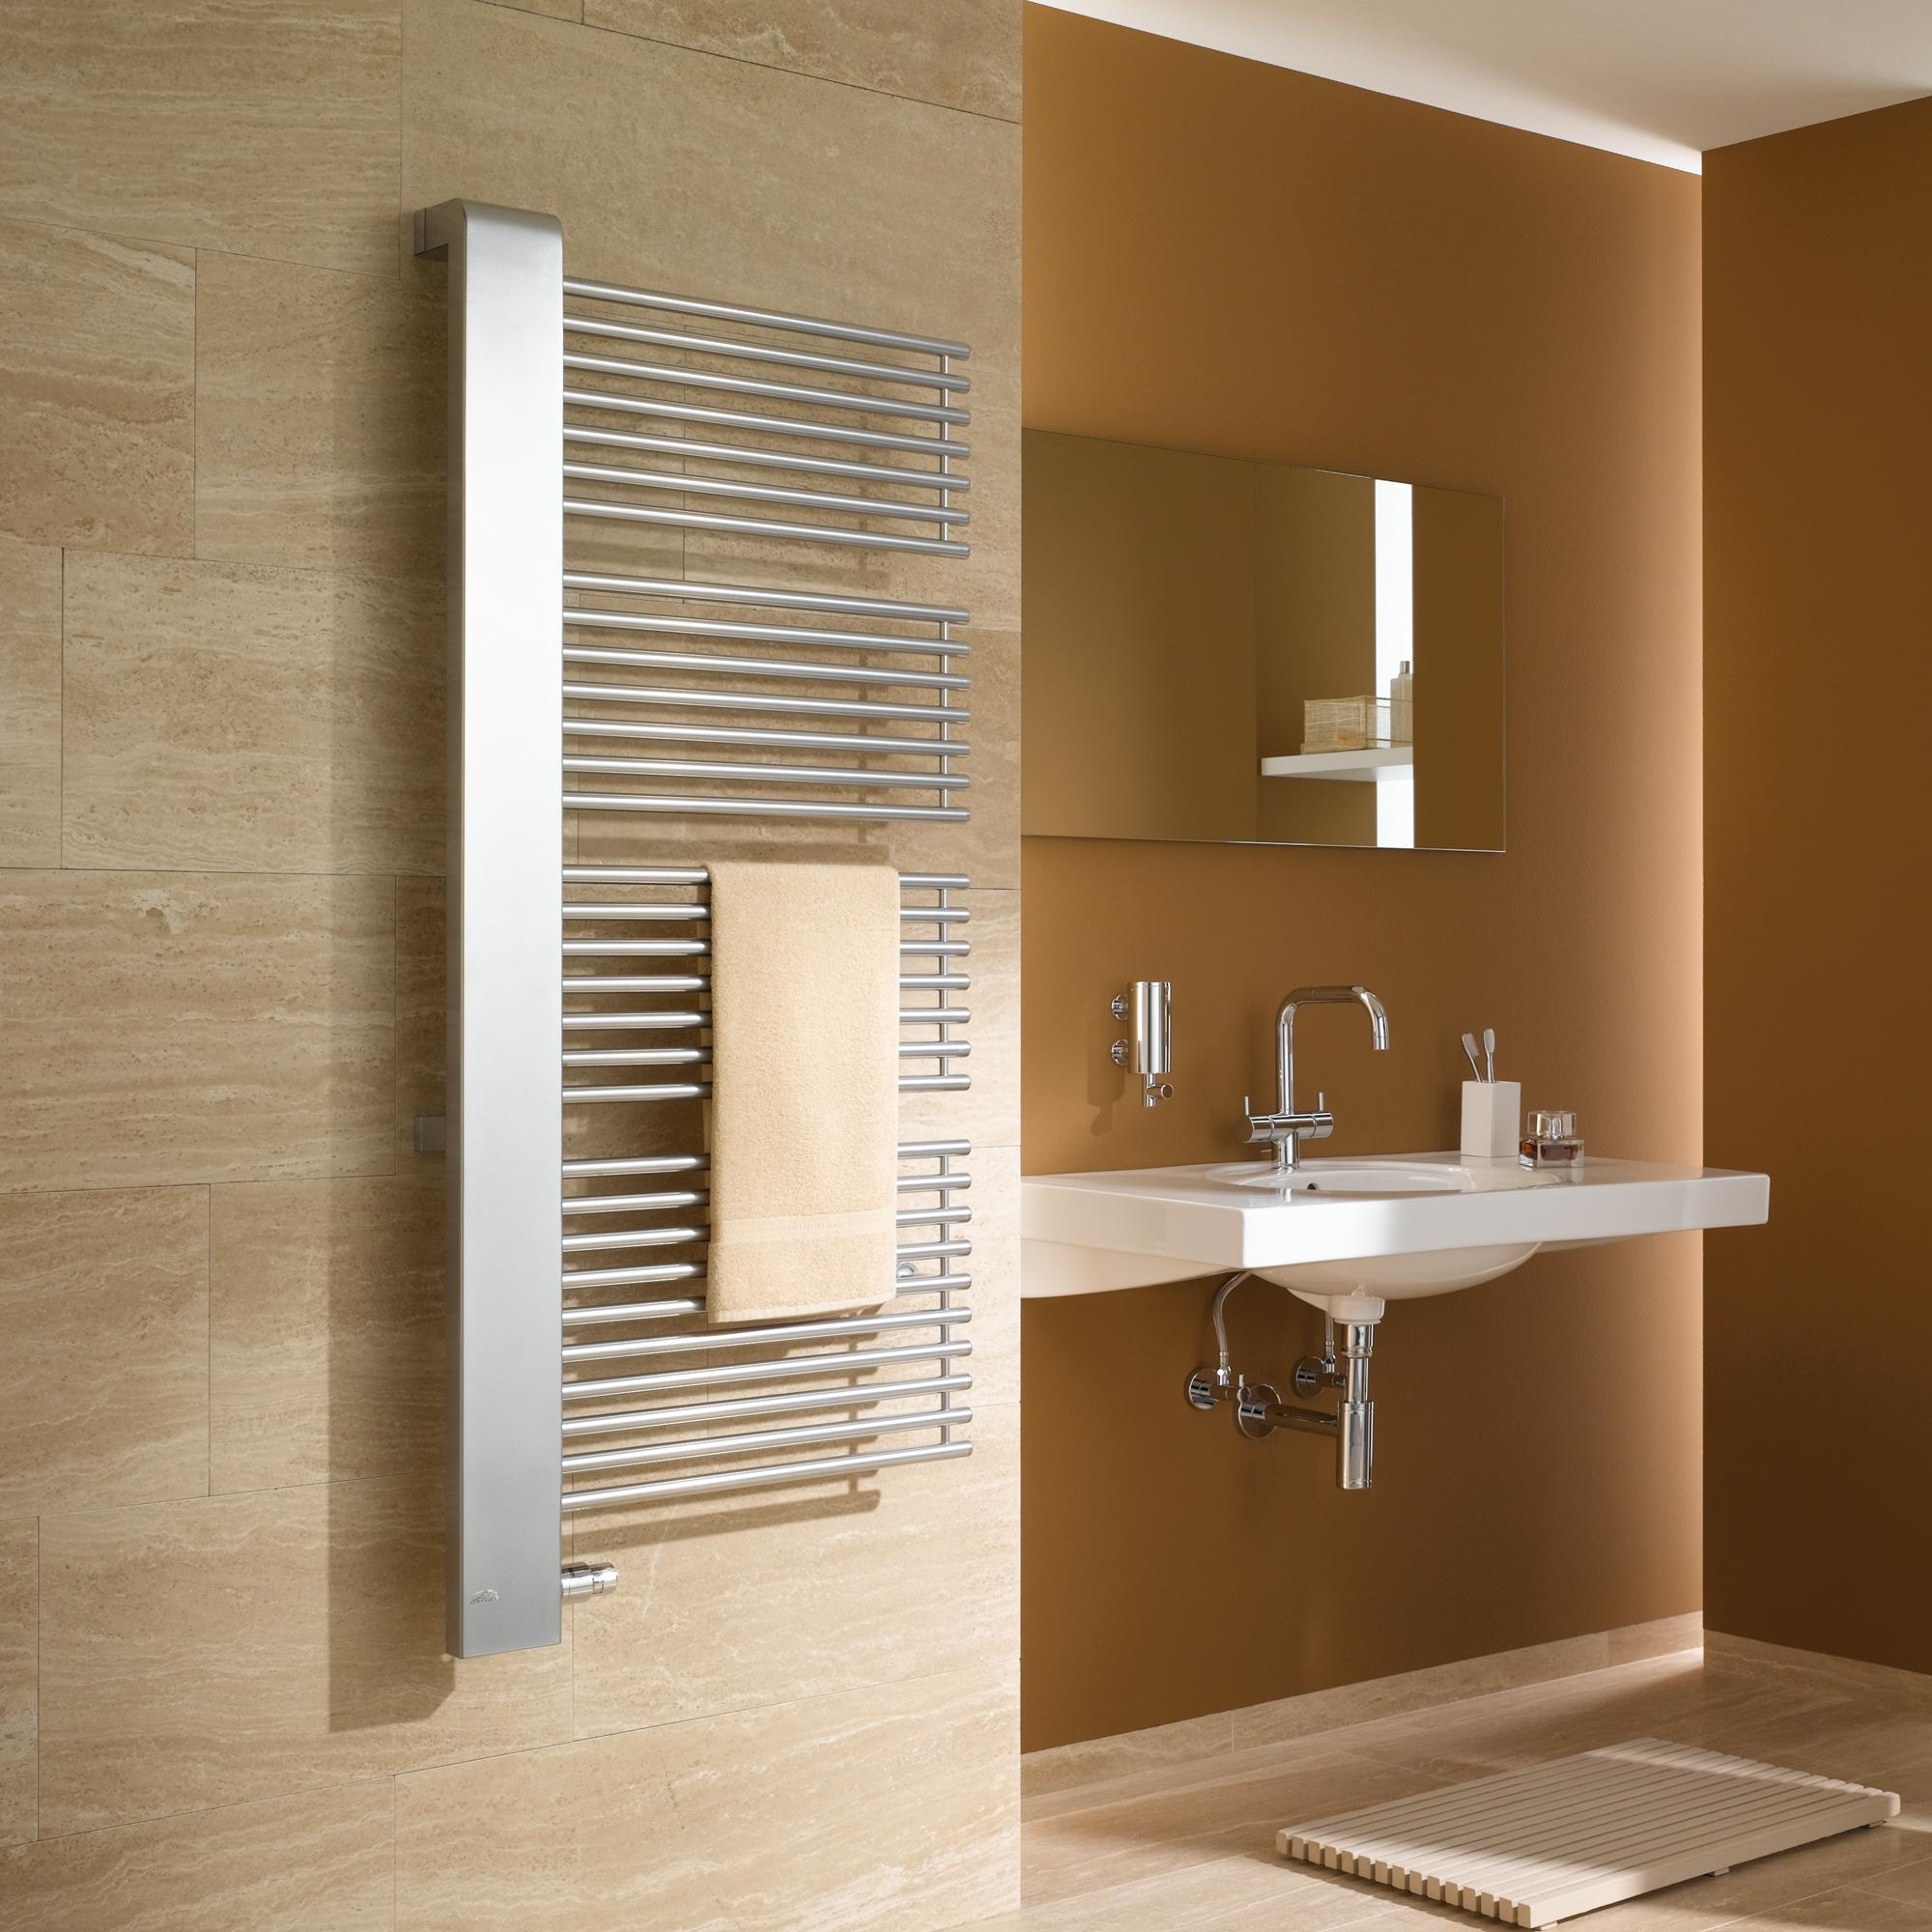 kermi credo half badheizk rper b 61 h 188 4 cm ausf hrung links chrom blende glanz silber. Black Bedroom Furniture Sets. Home Design Ideas